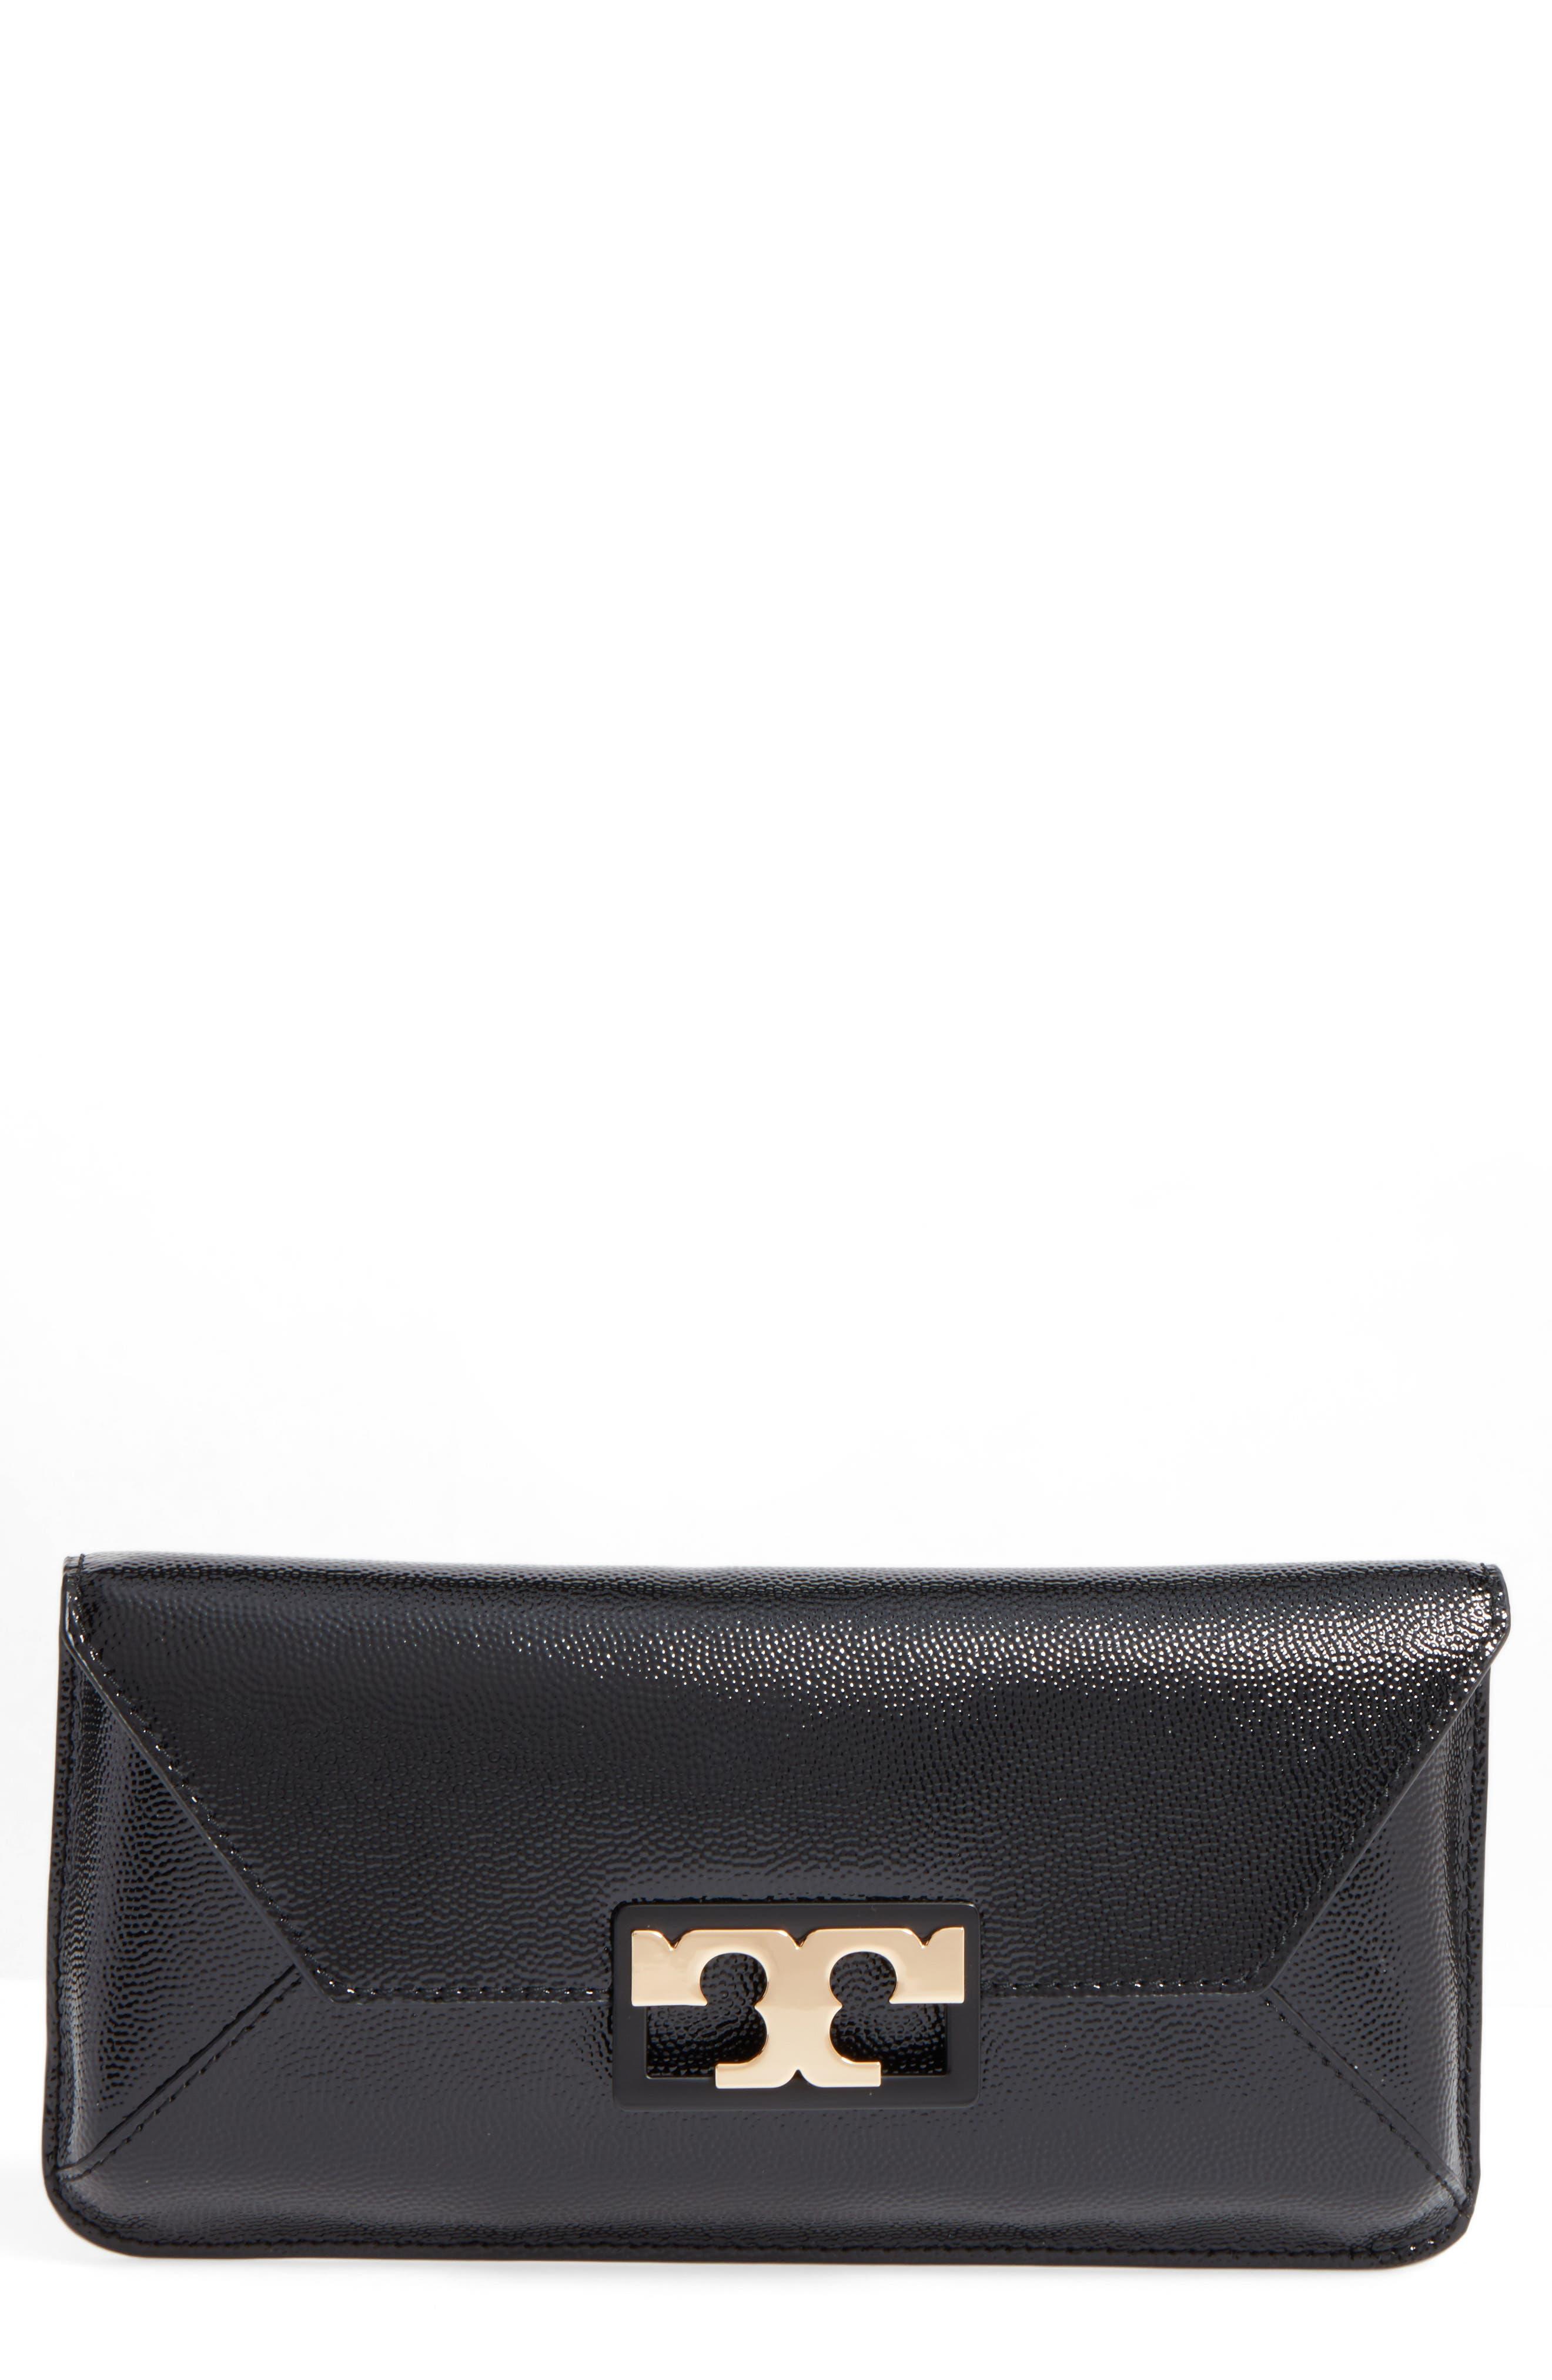 TORY BURCH Gigi Caviar Leather Clutch, Main, color, 001